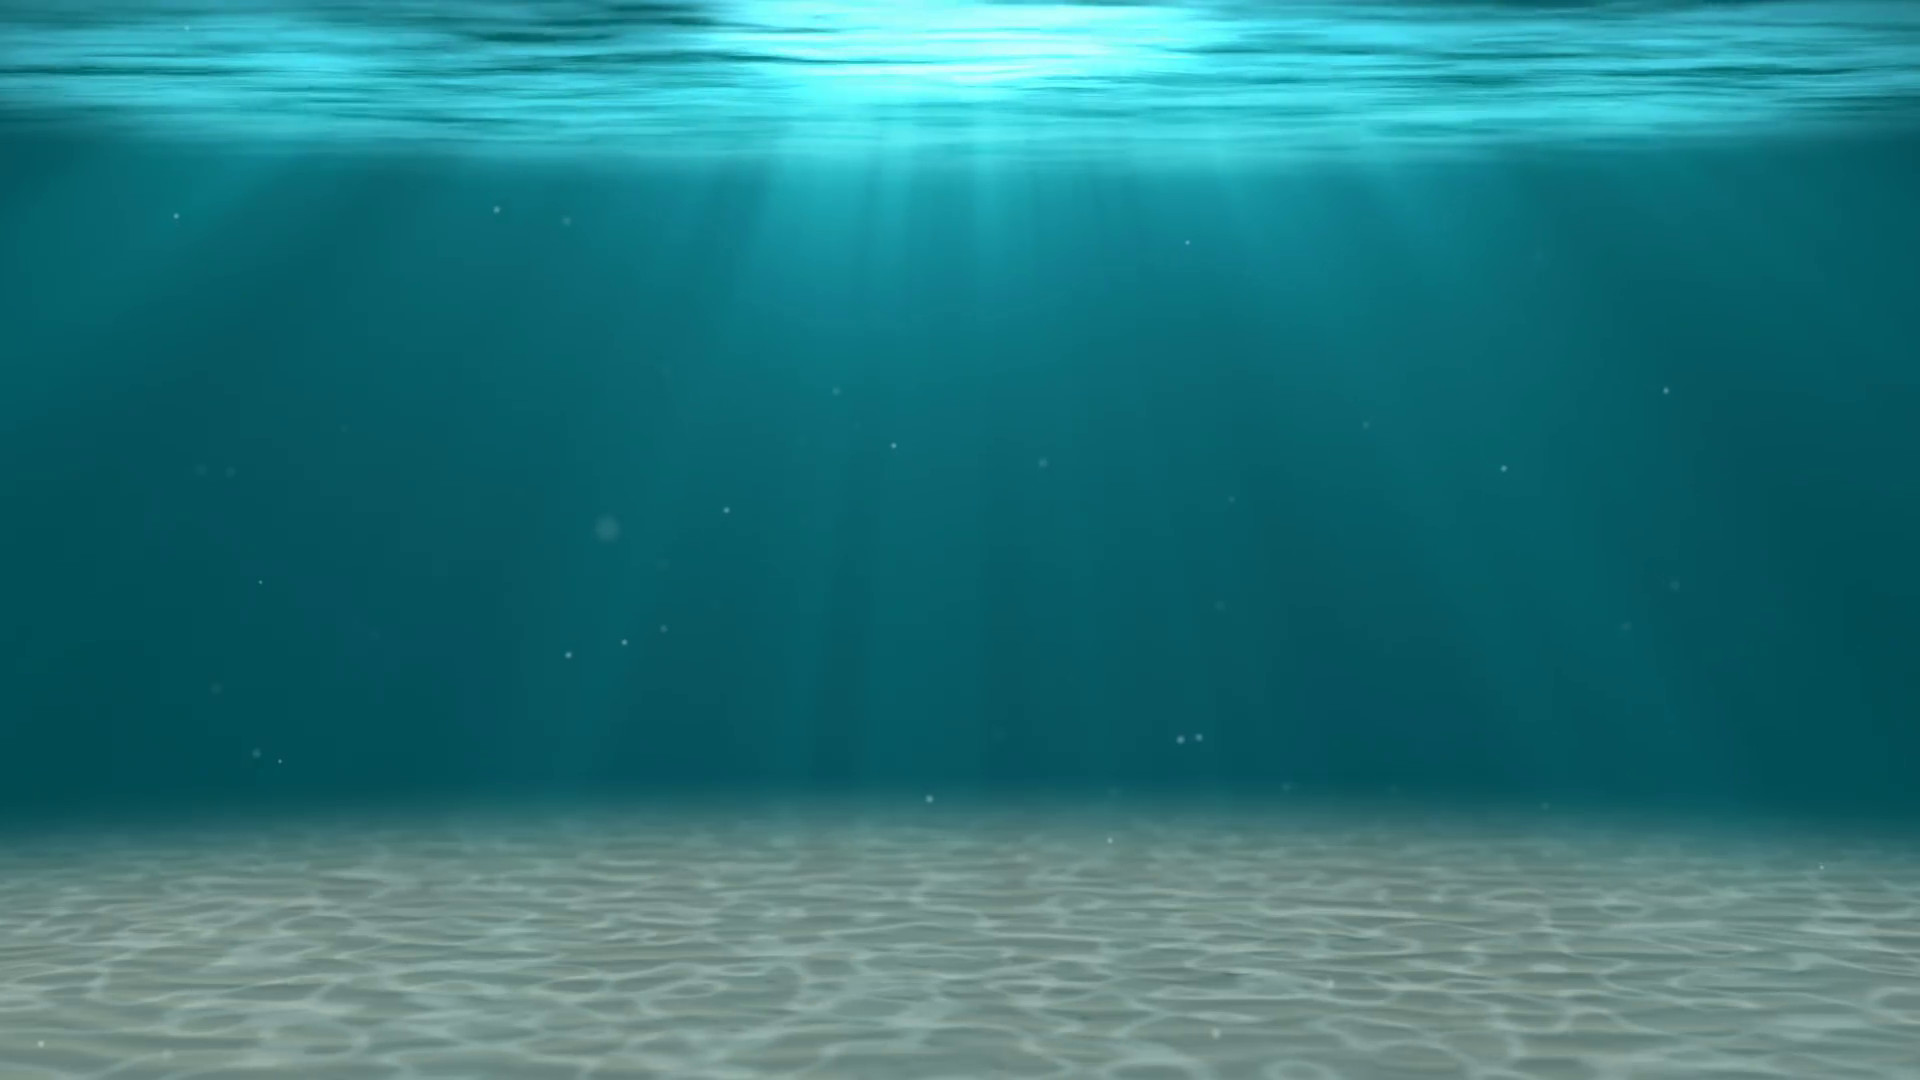 Blue Sea Bottom Paint